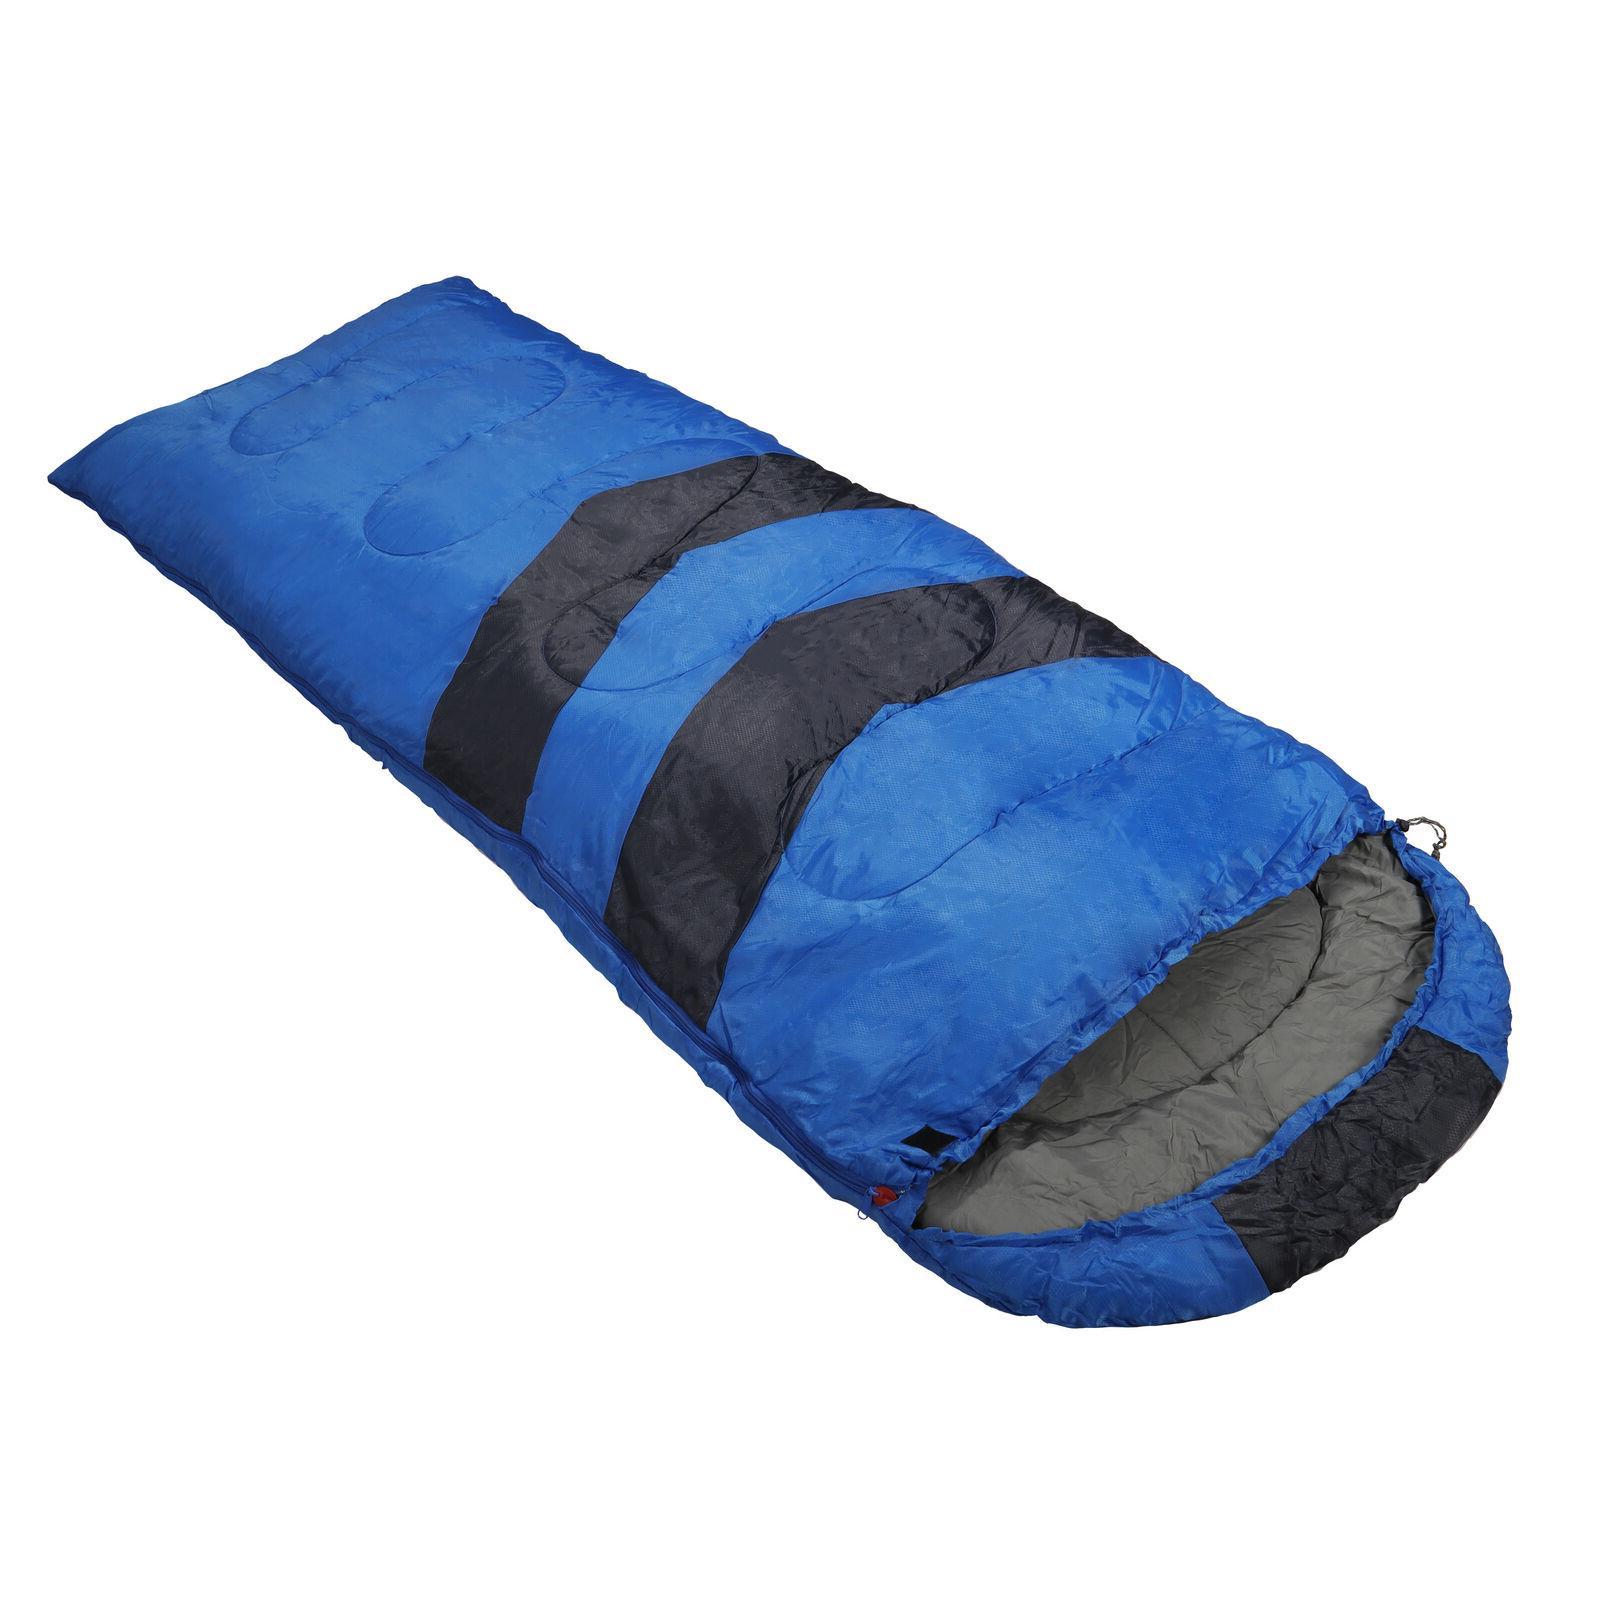 Outdoor Waterproof Sleeping Backpacking Adults Warm Hiking